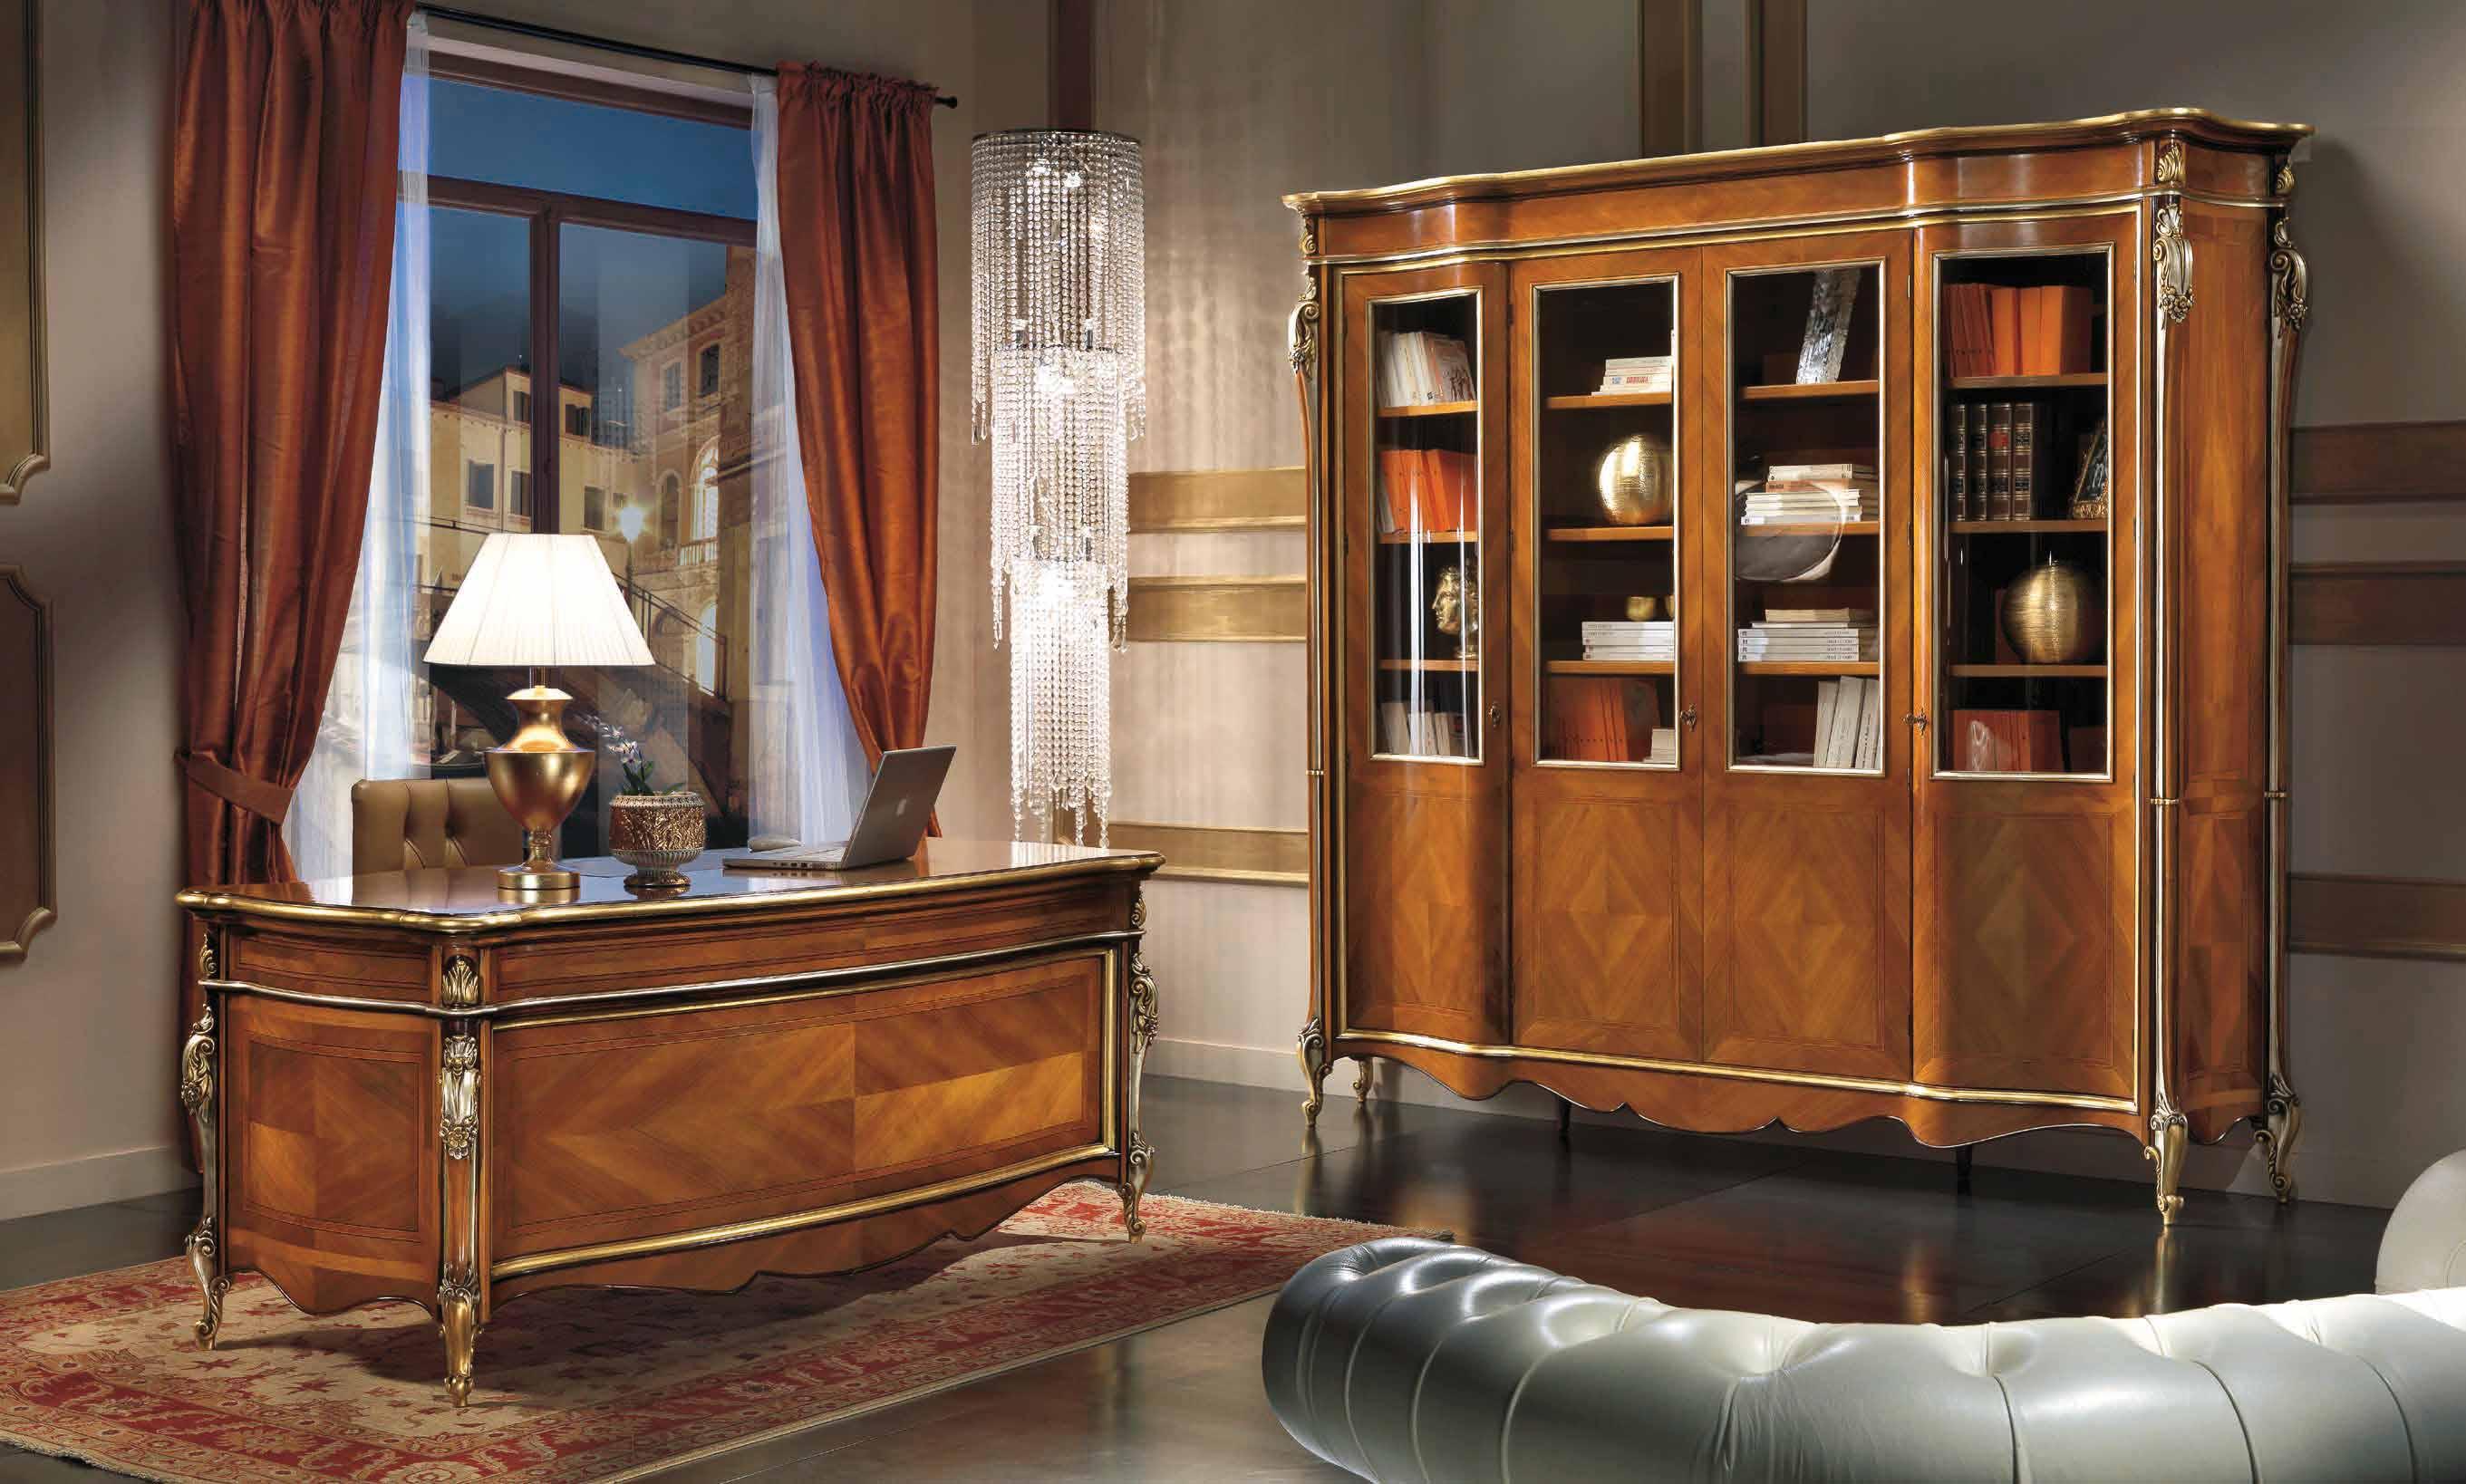 Библиотека 2051 k6 scappini & c - стеллажи - гостиная - купи.